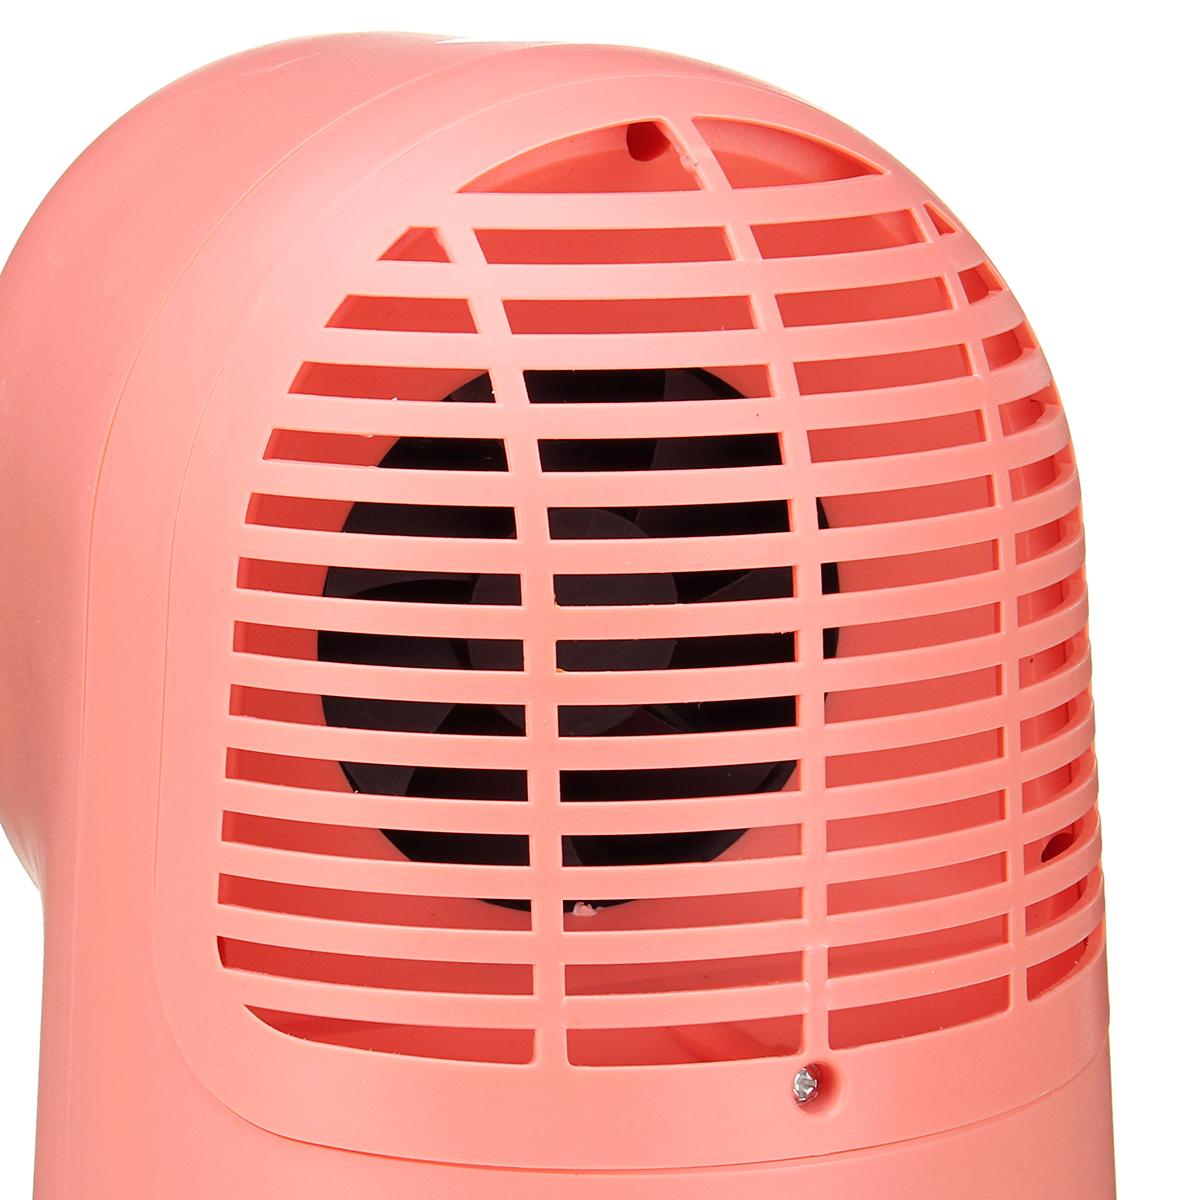 500W Portable Electric Space Heater Desktop Heating Fan Handy Air Warmer Home Office